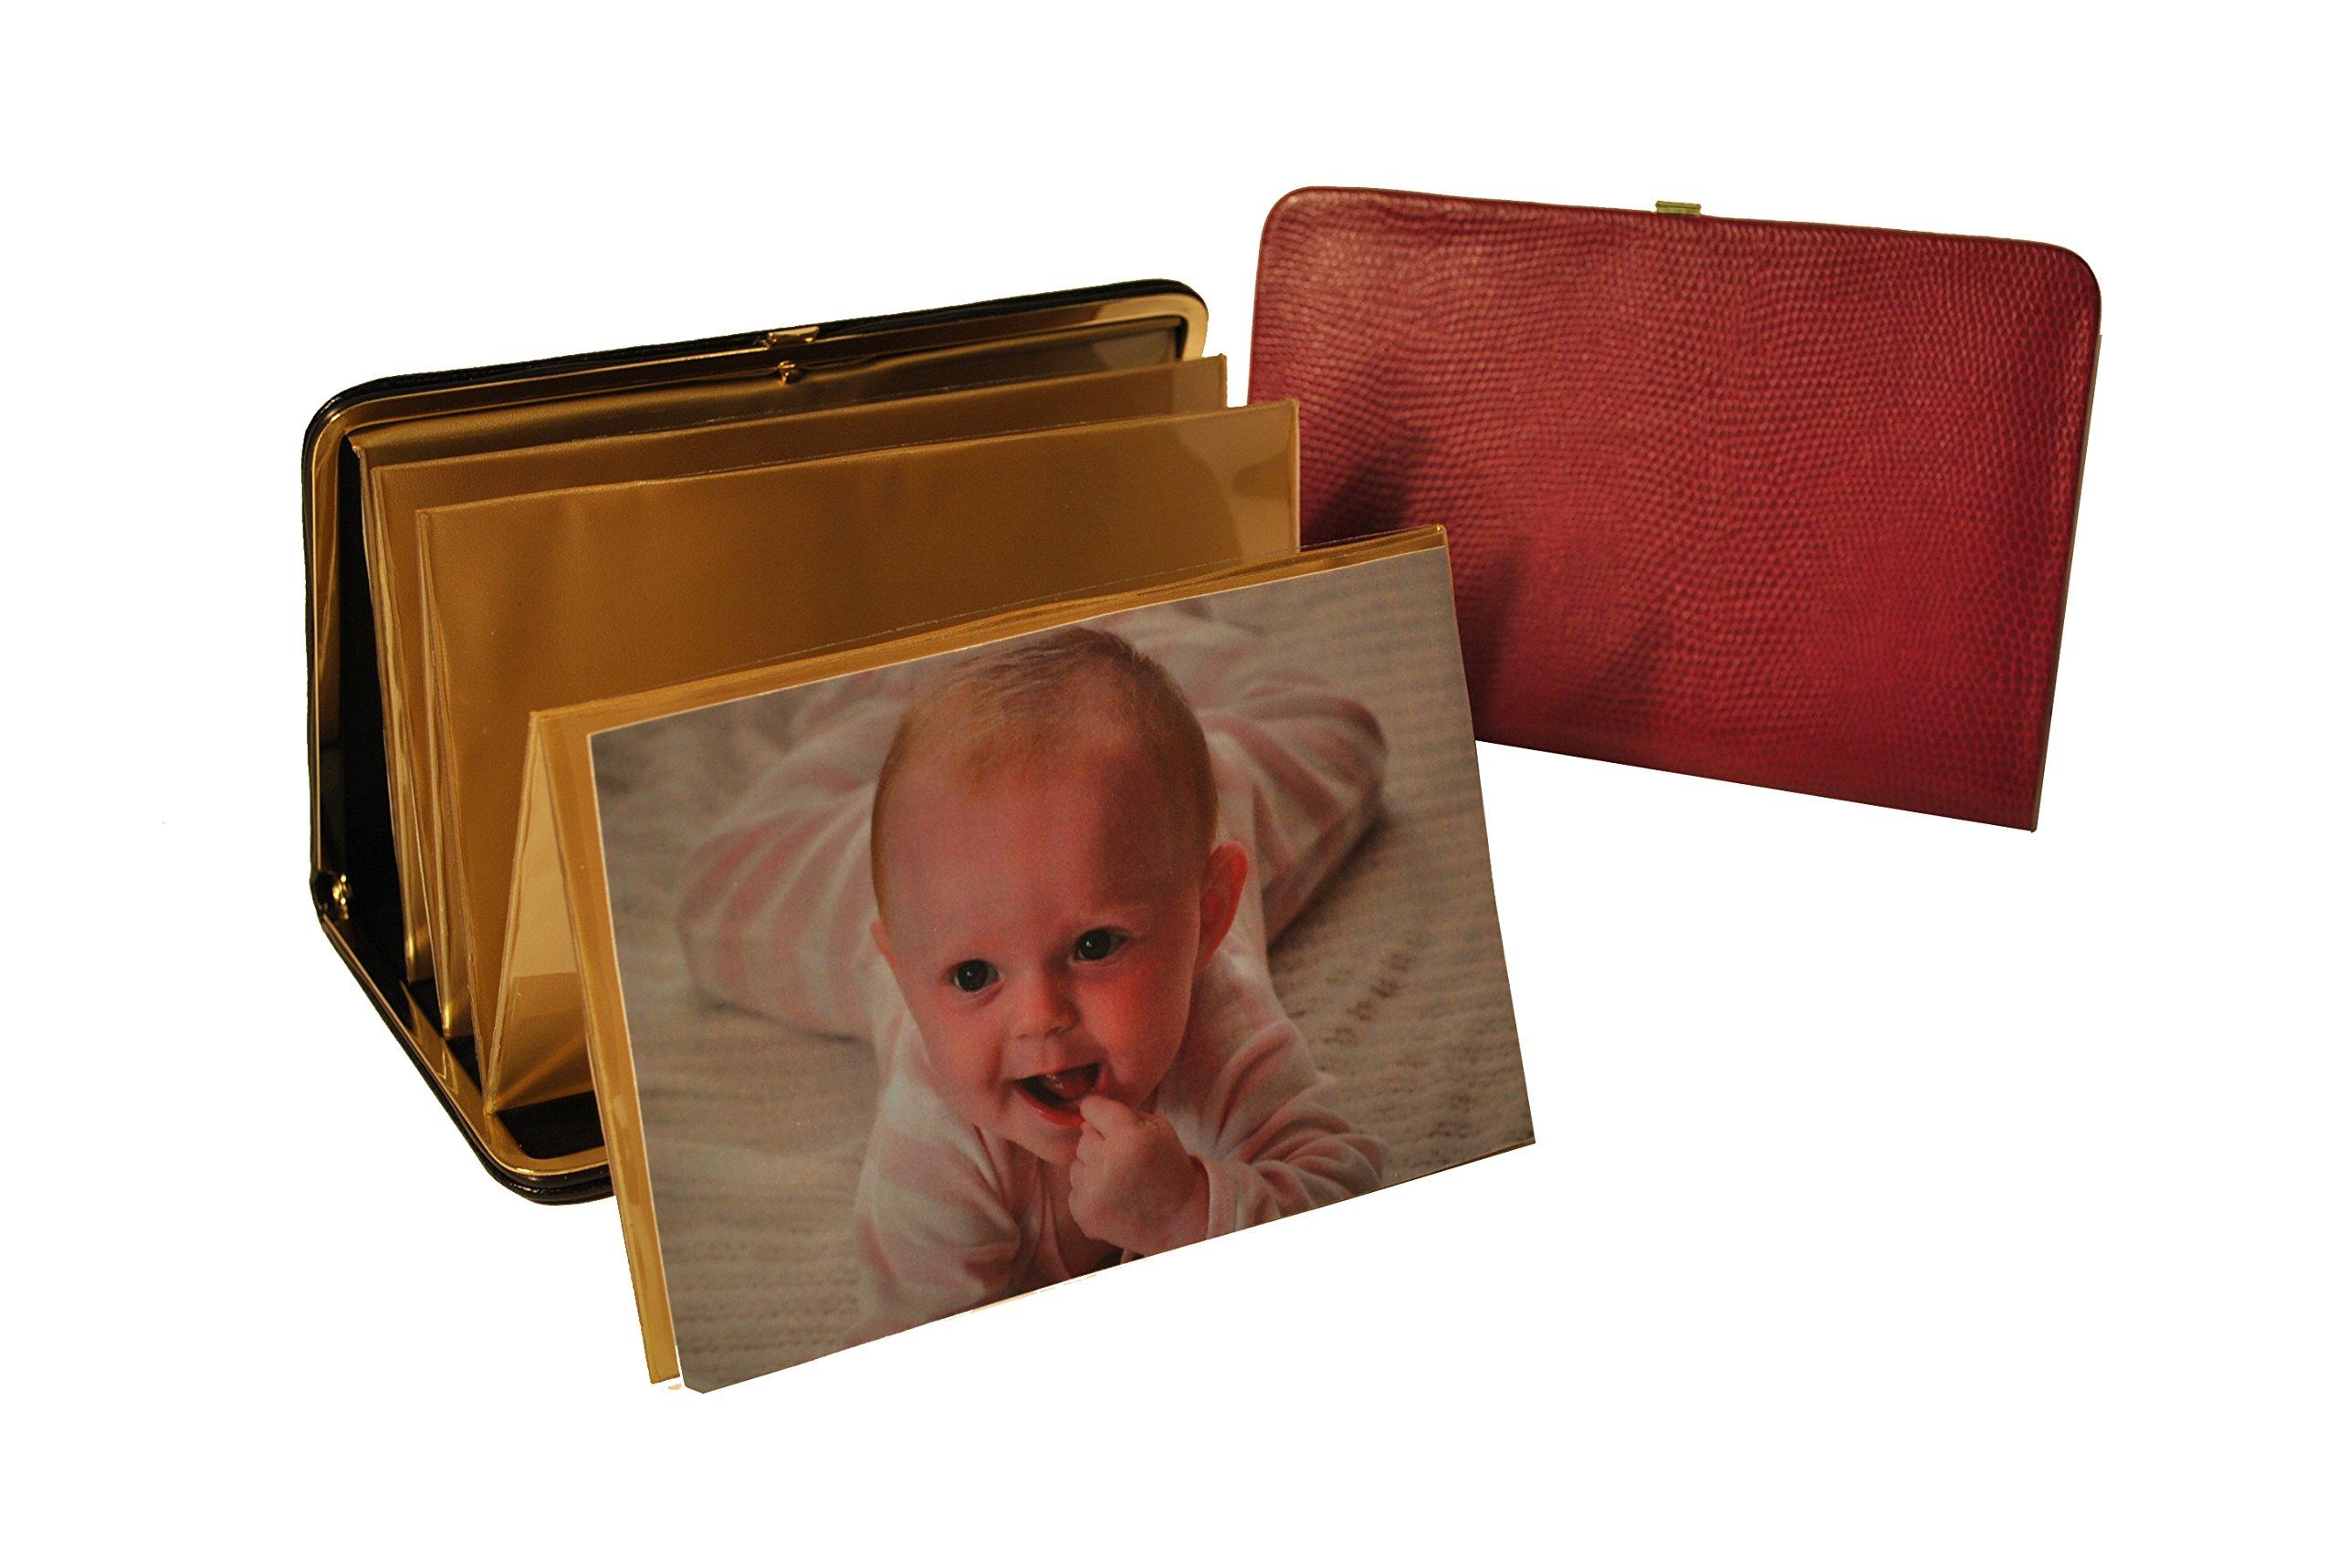 Budd Leather Lizard Print Portable Framed Photo Case, 4 by 6-Inch, Fuchsia